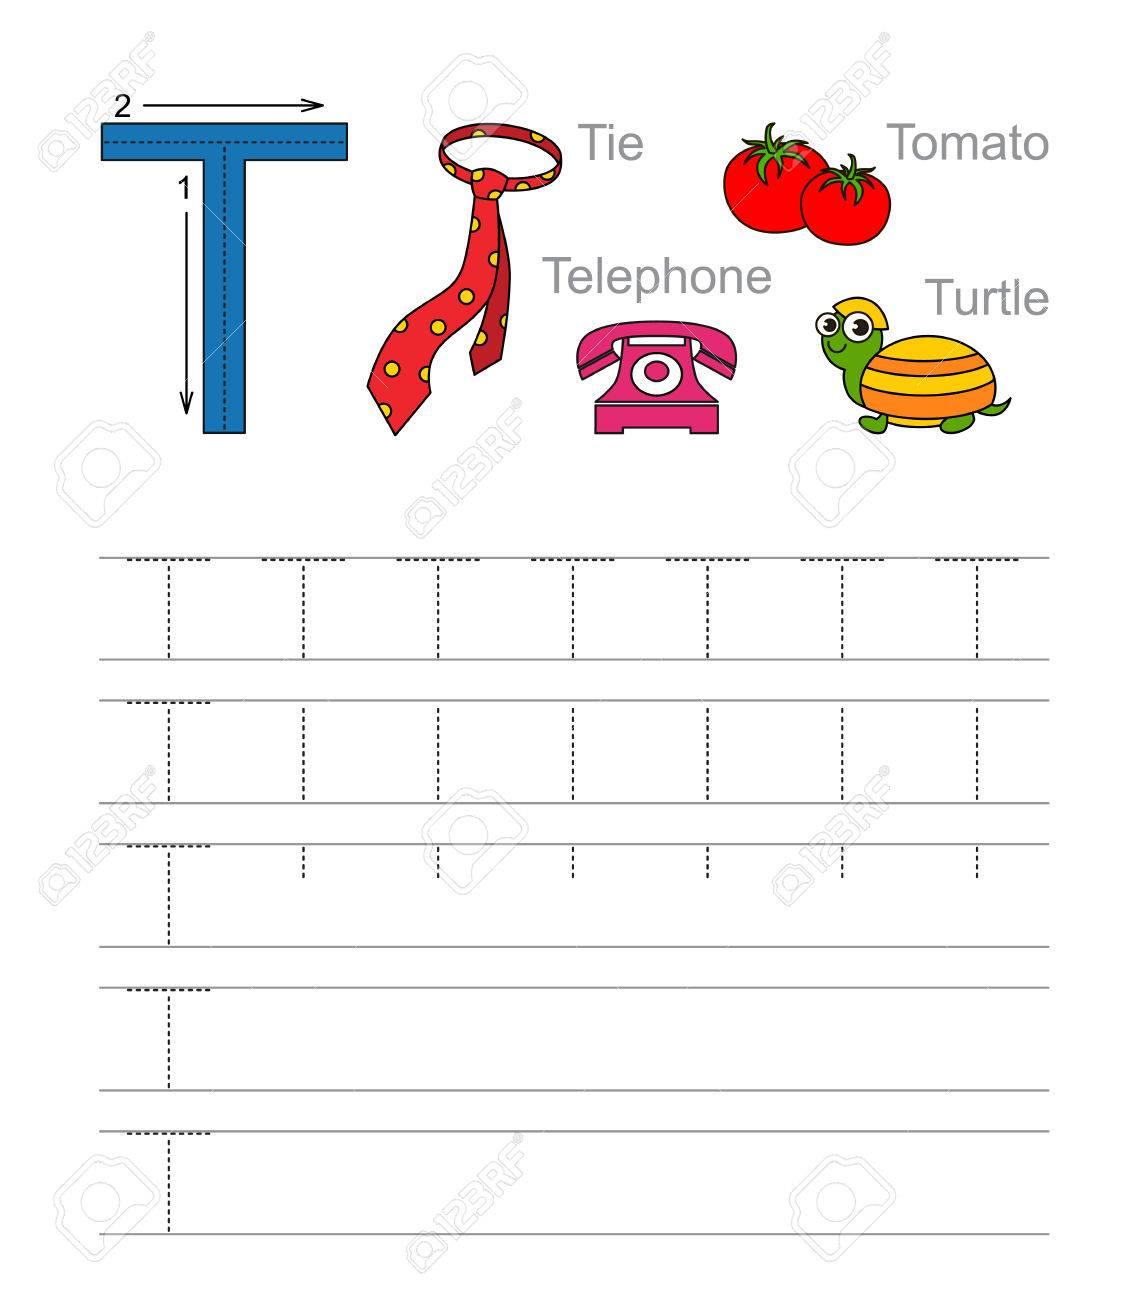 Großartig Buchstaben T Tracing Arbeitsblätter Vorschule Ideen ...